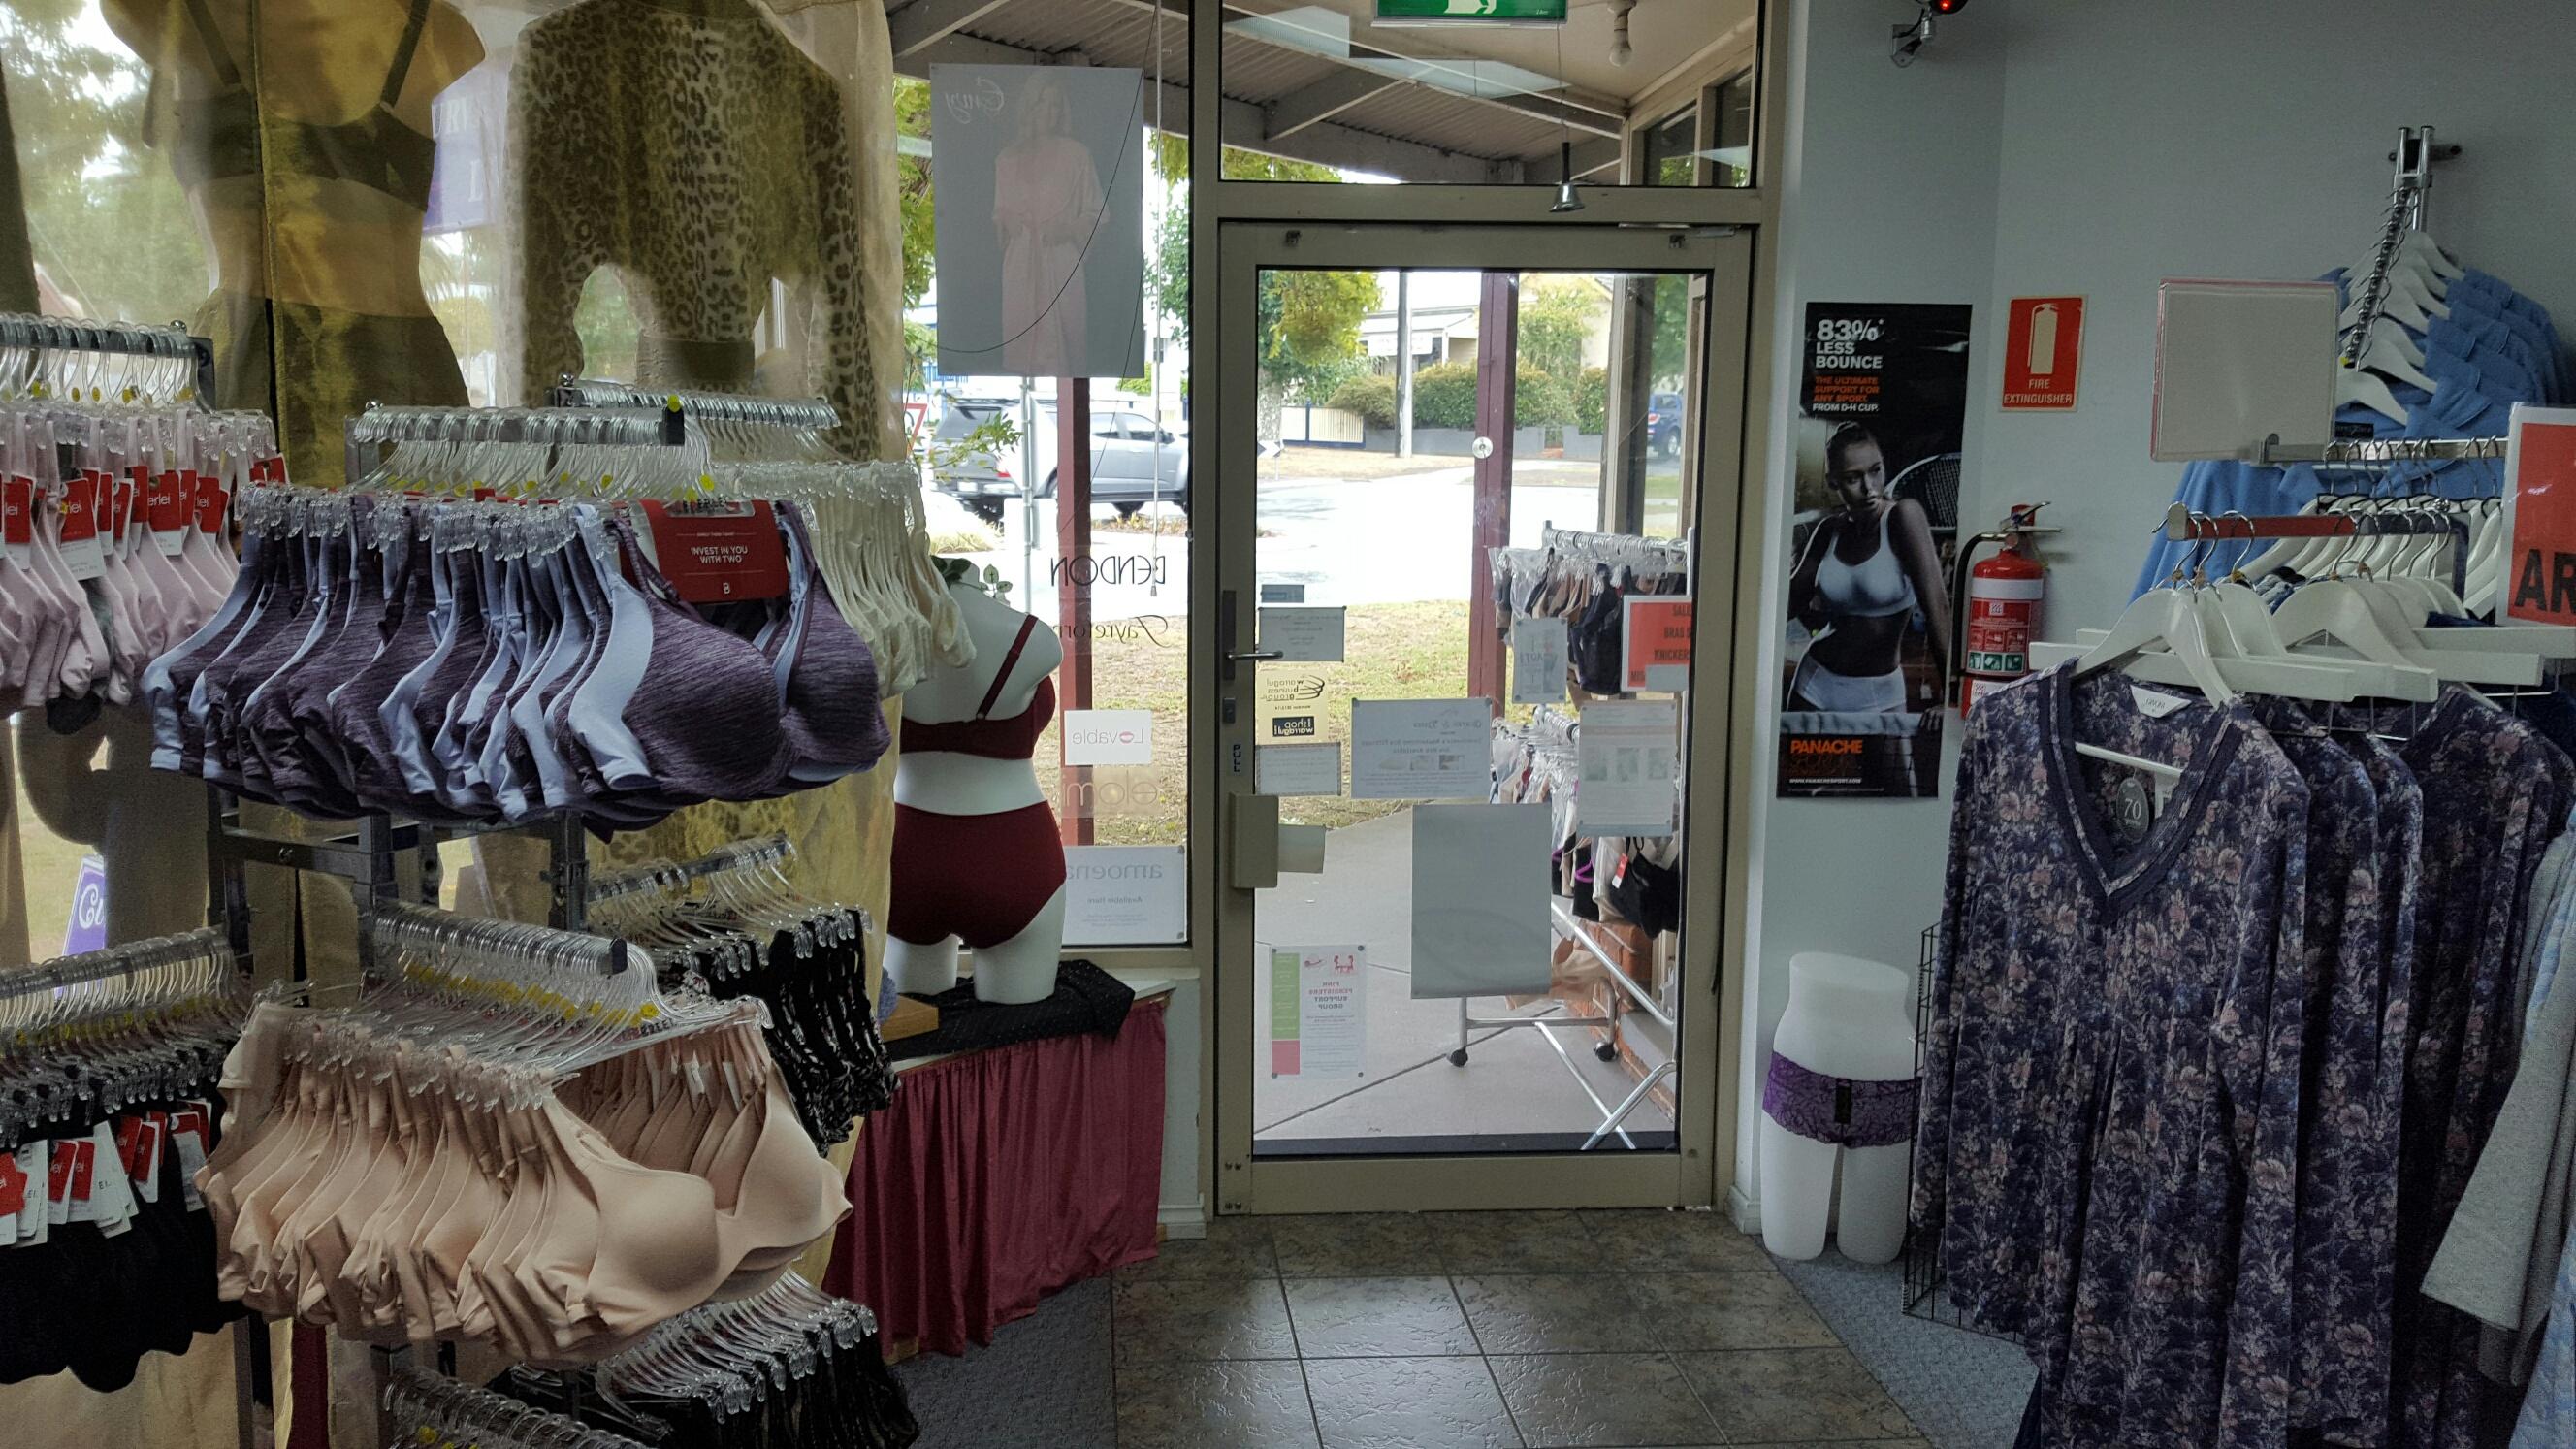 lingerie-business-for-sale-6